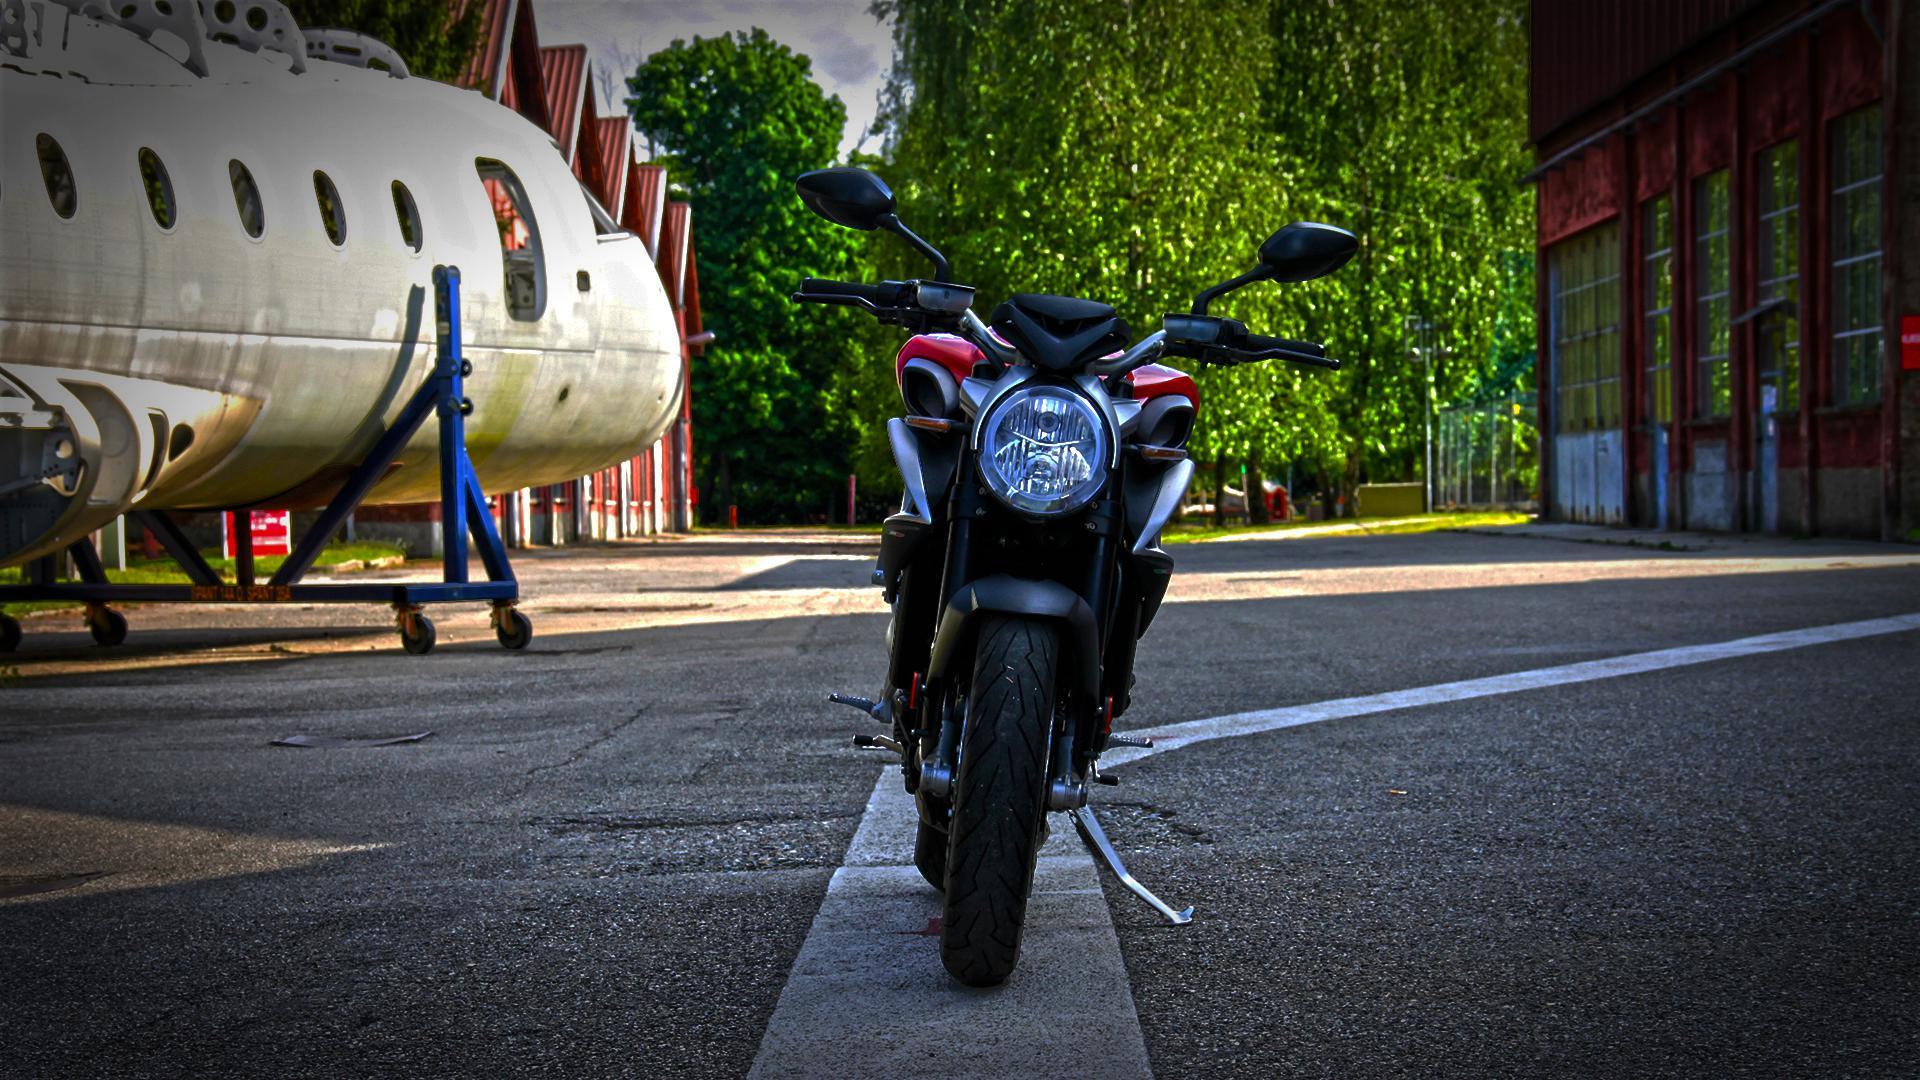 mv-agusta-brutale-800-prova-test-35